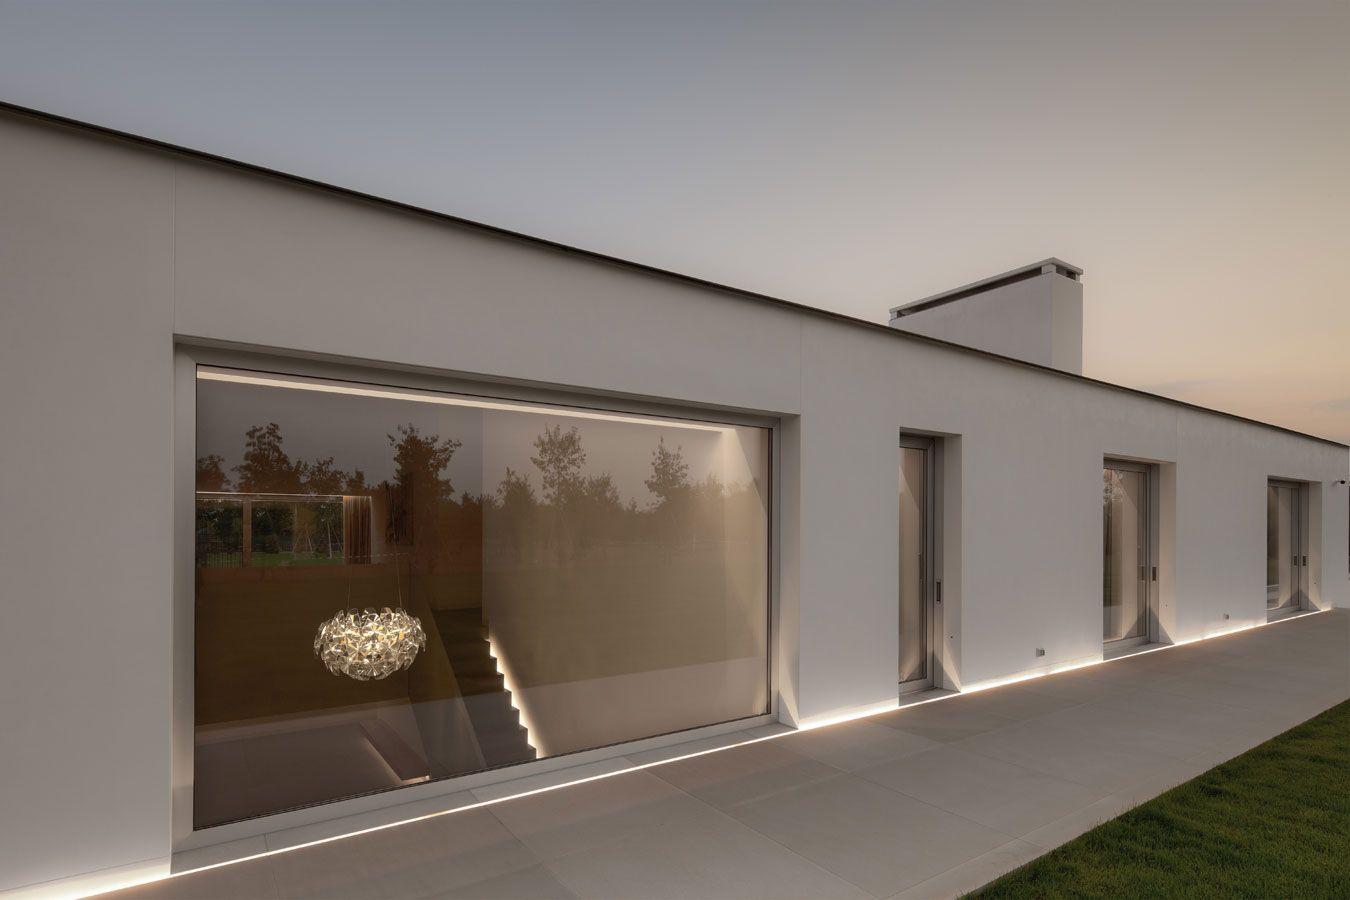 John pawson casa delle bottere treviso modern for Idee architettura interni